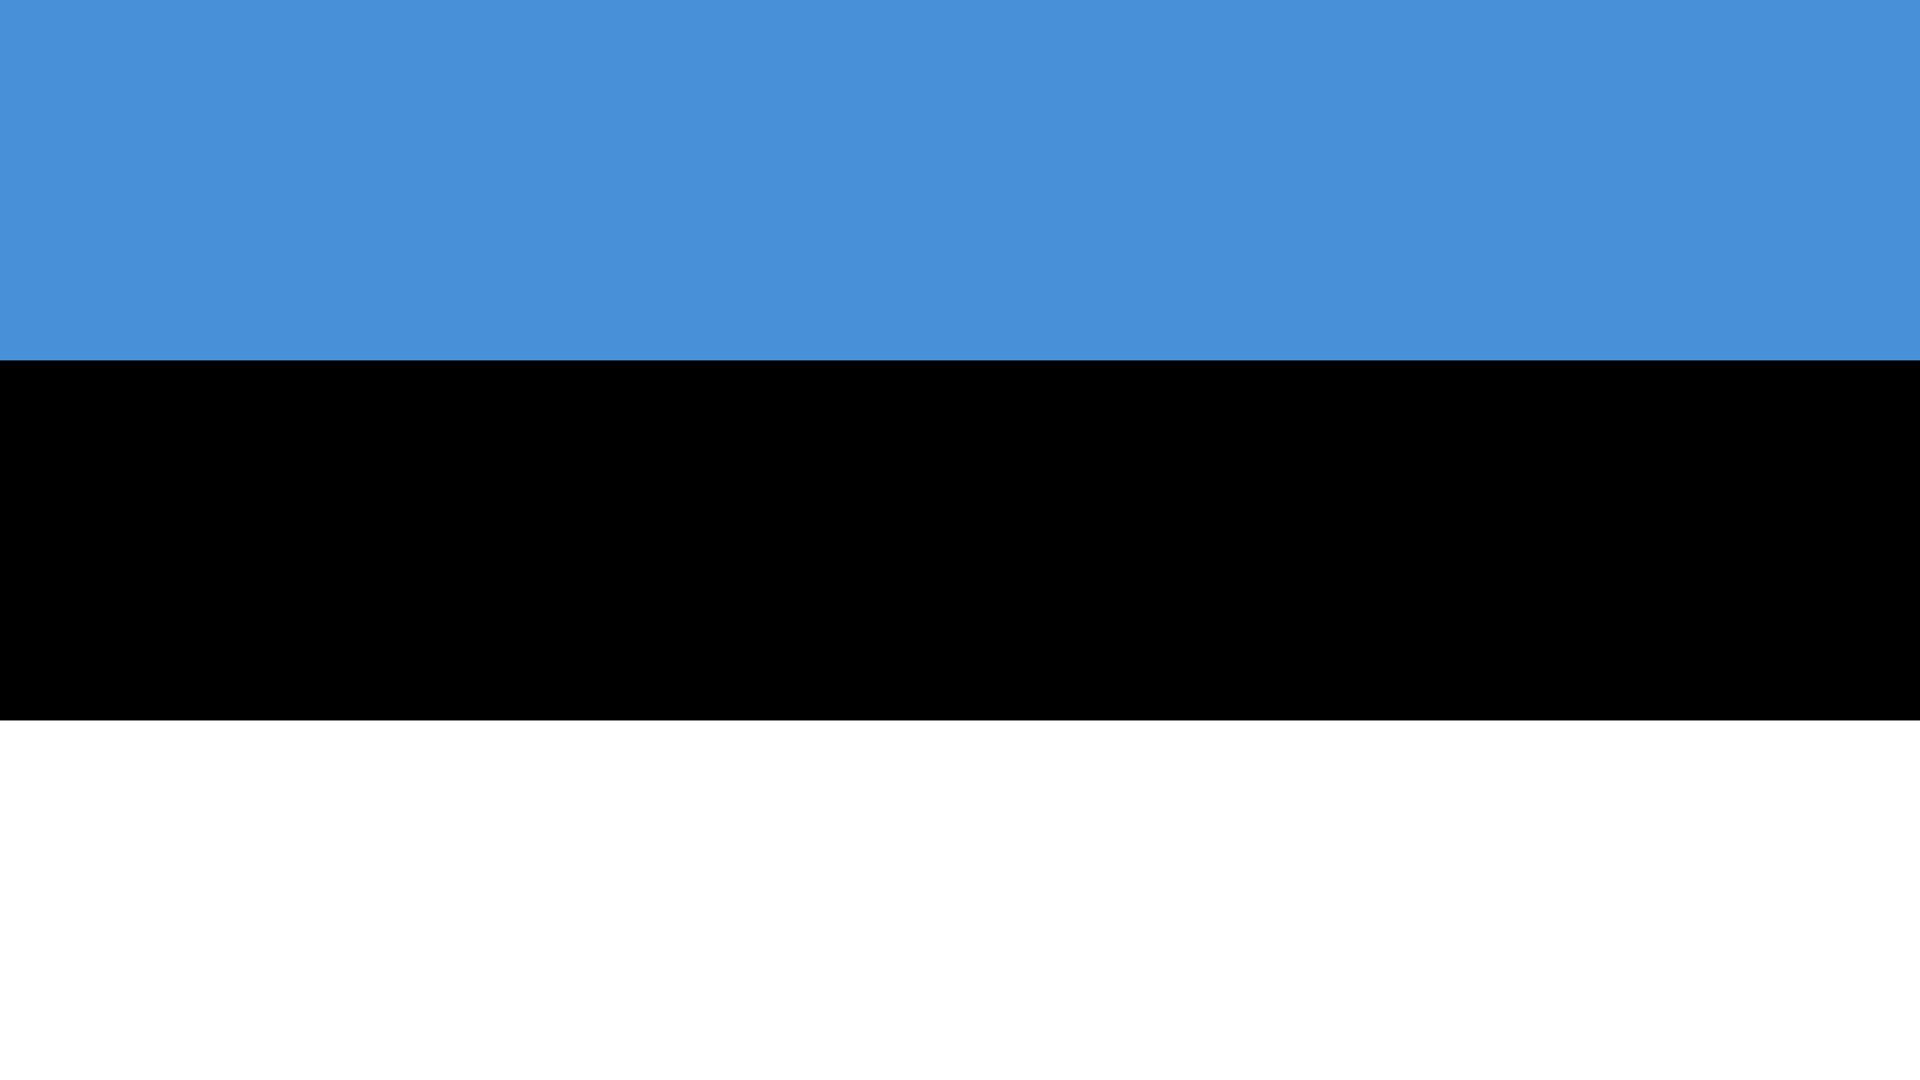 Hd Car Wallpapers 1920x1080 Free Download Estonia Flag Wallpaper High Definition High Quality